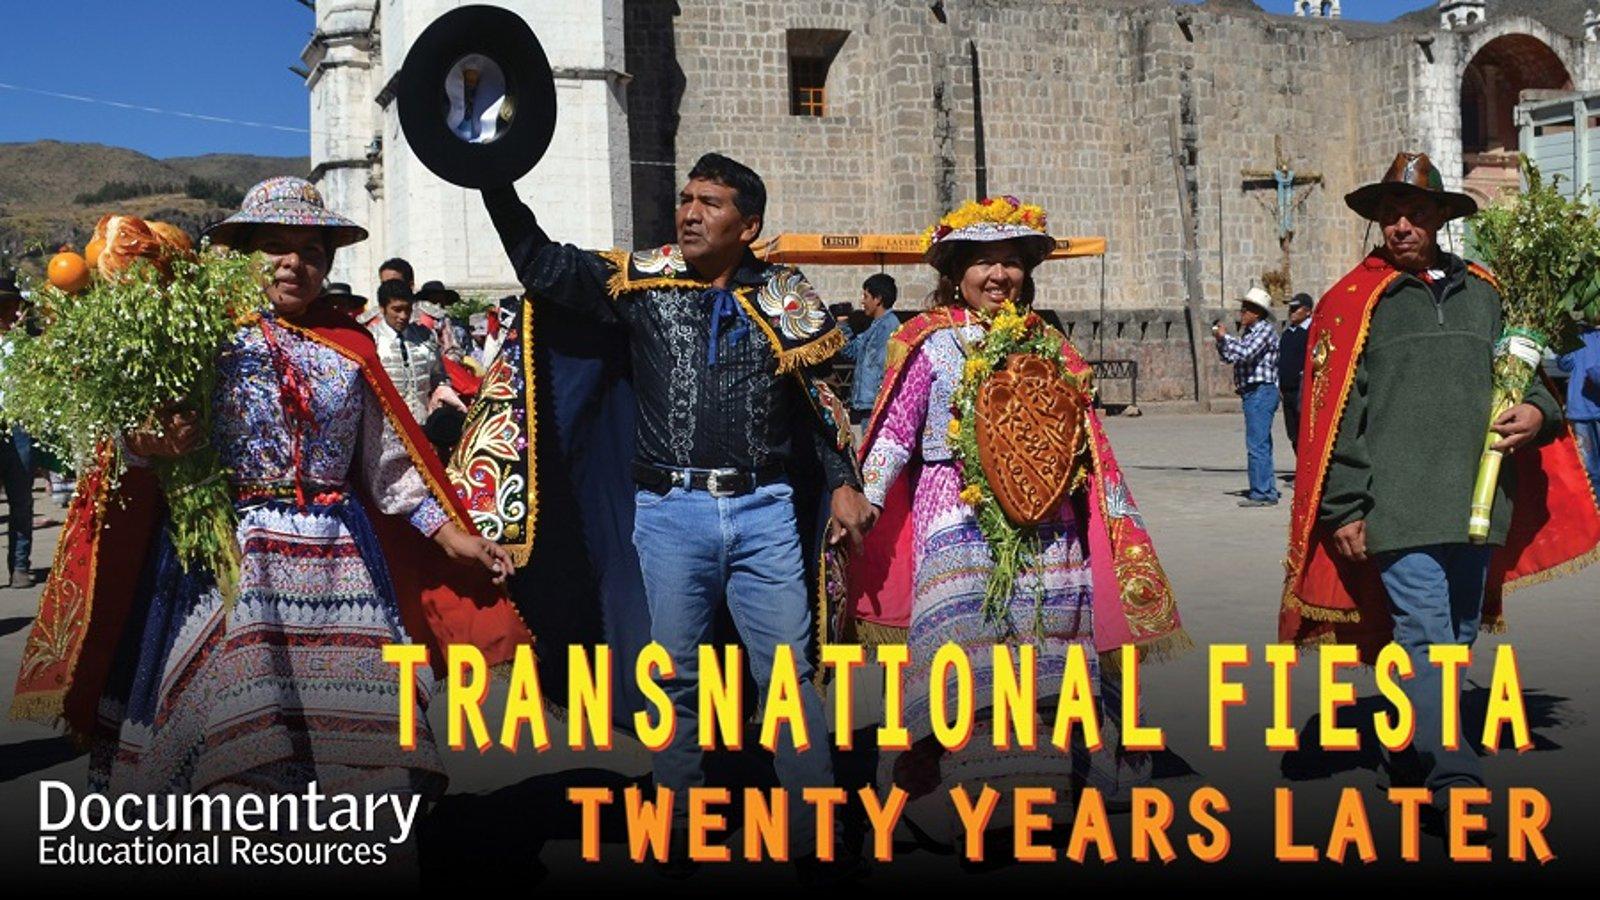 Transnational Fiesta: Twenty Years Later - The Evolution of Transmigrant Communities